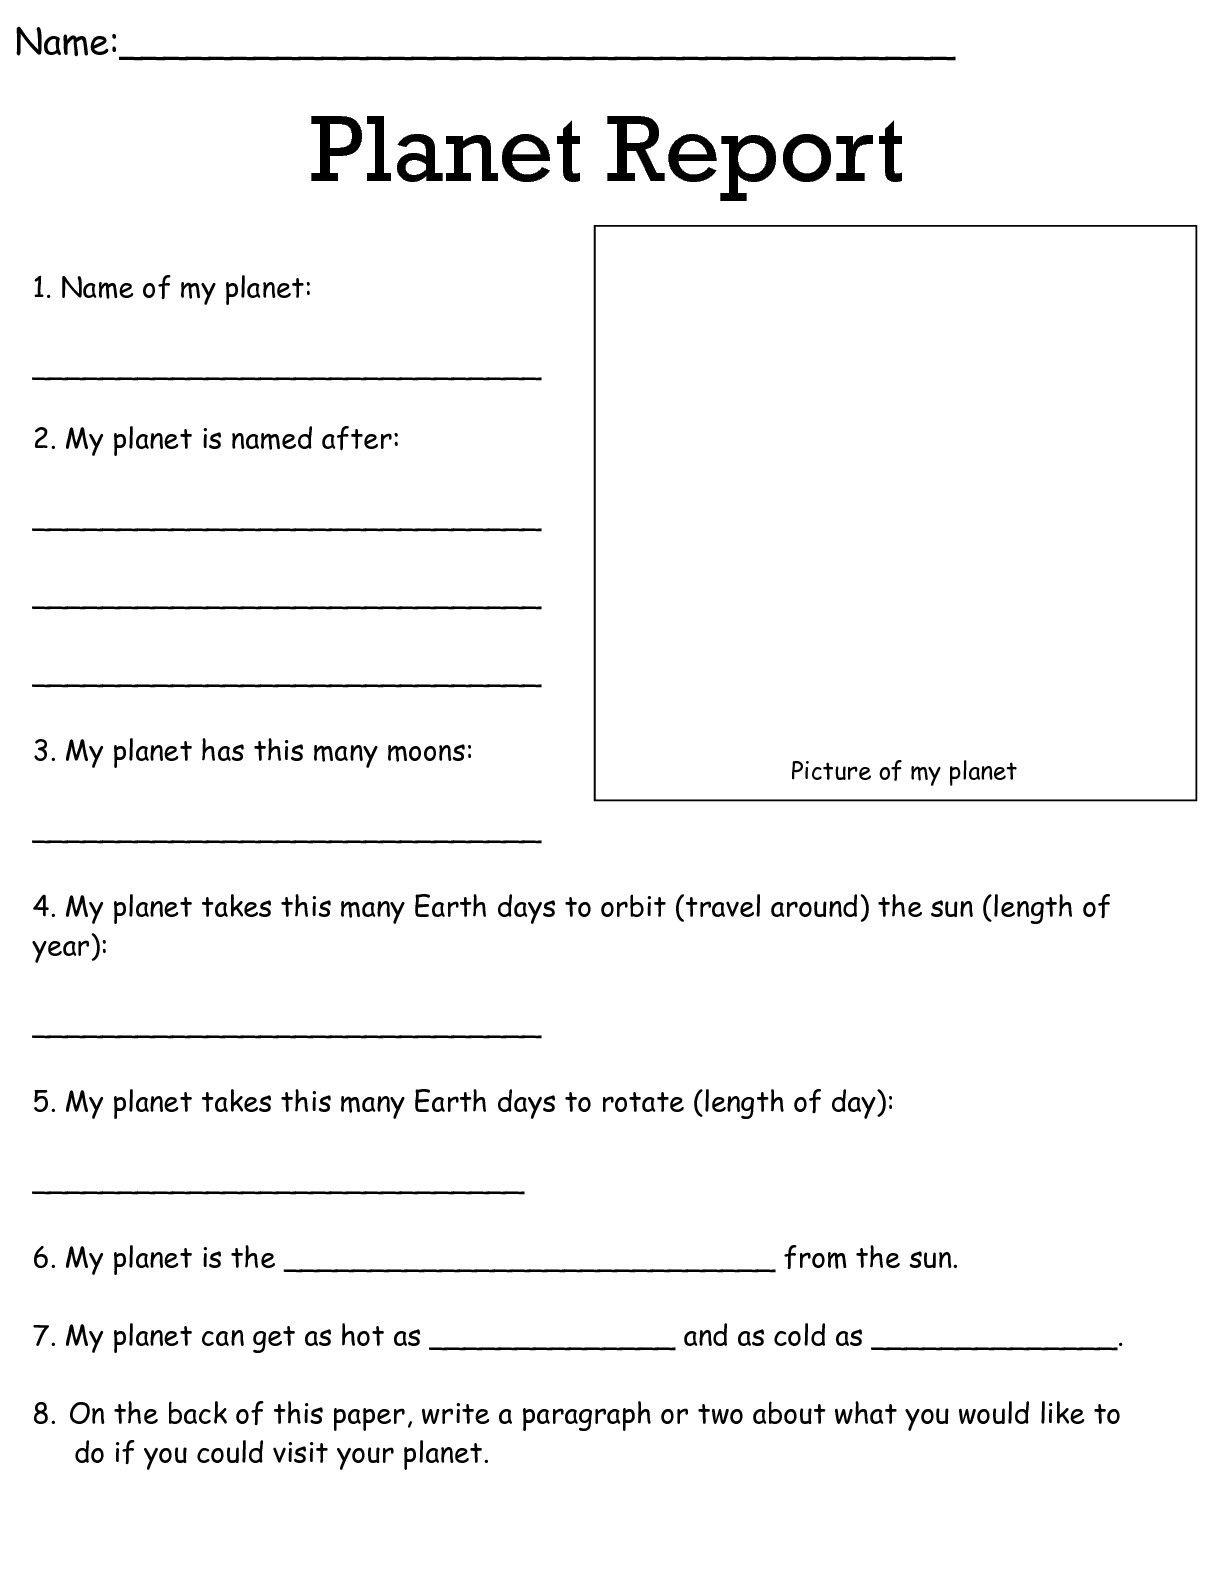 Job Worksheets 5Th &6Th | Science Worksheets Science Worksheets - Free Printable Science Worksheets